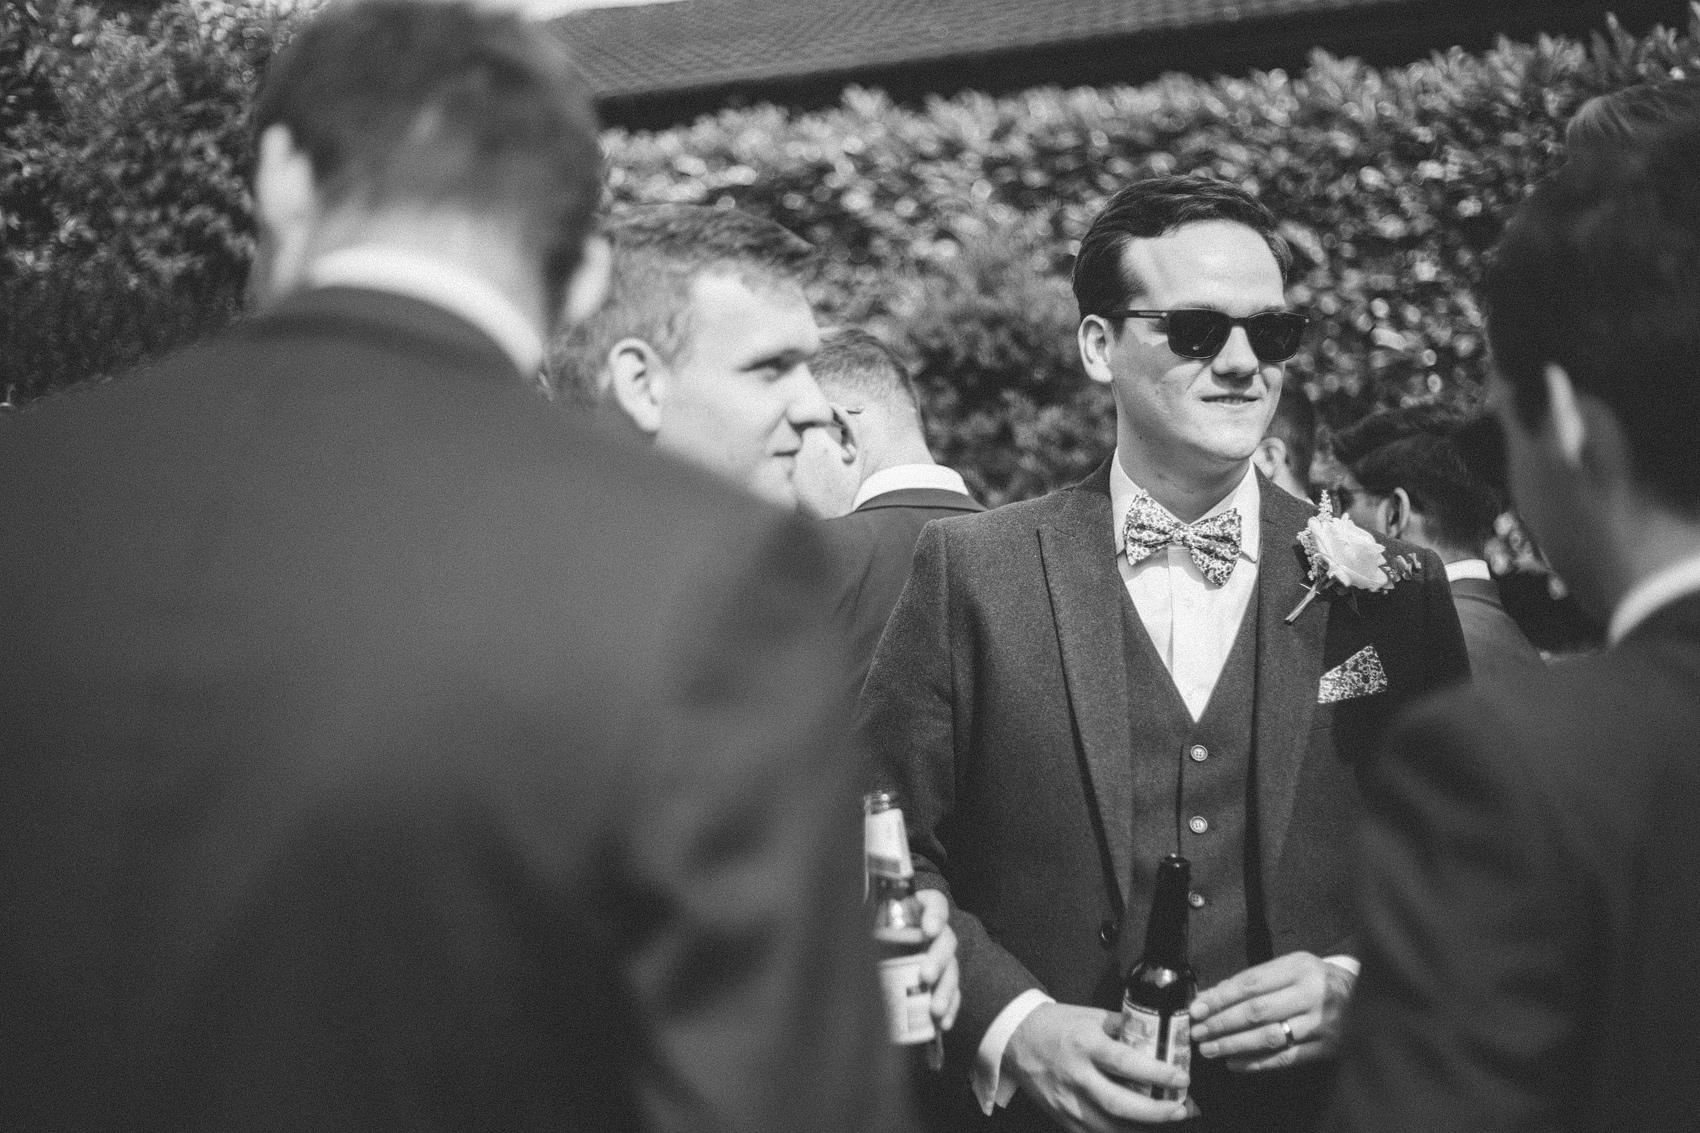 Dilhorne_Village_Hall_Wedding_Photography_-_42_.jpg